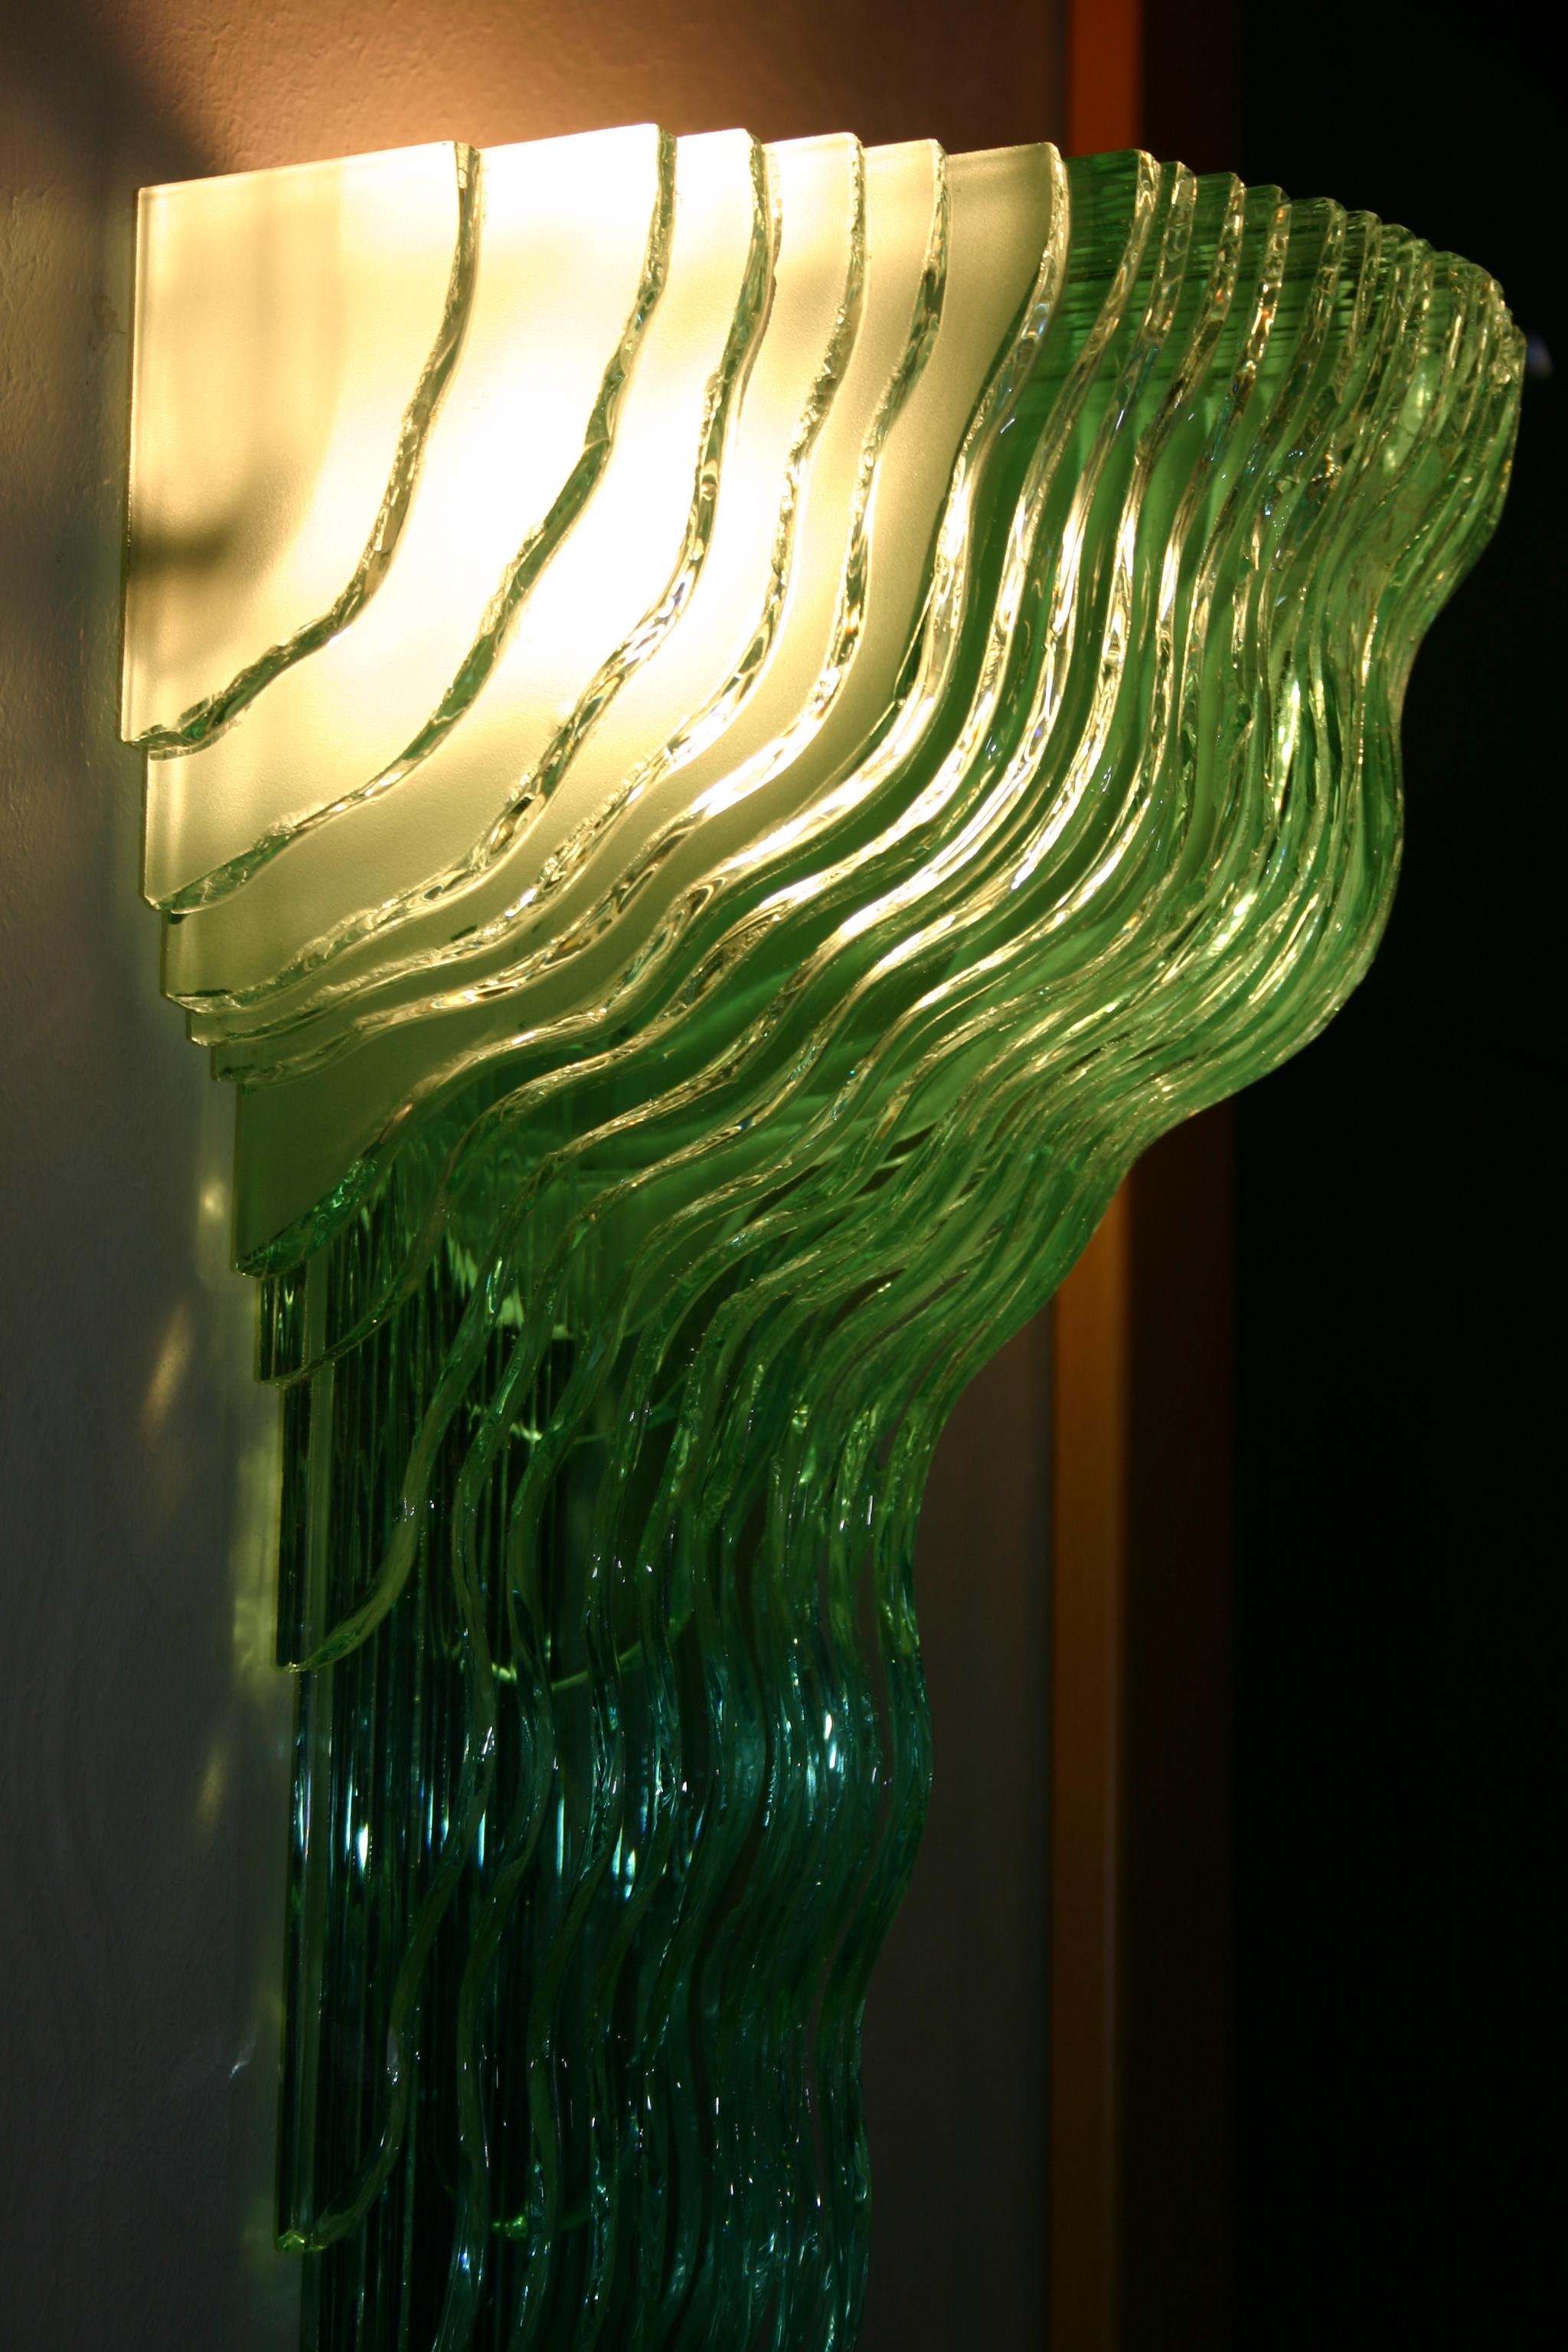 Hoffnungsflamme+lichtbrocken 046.jpg